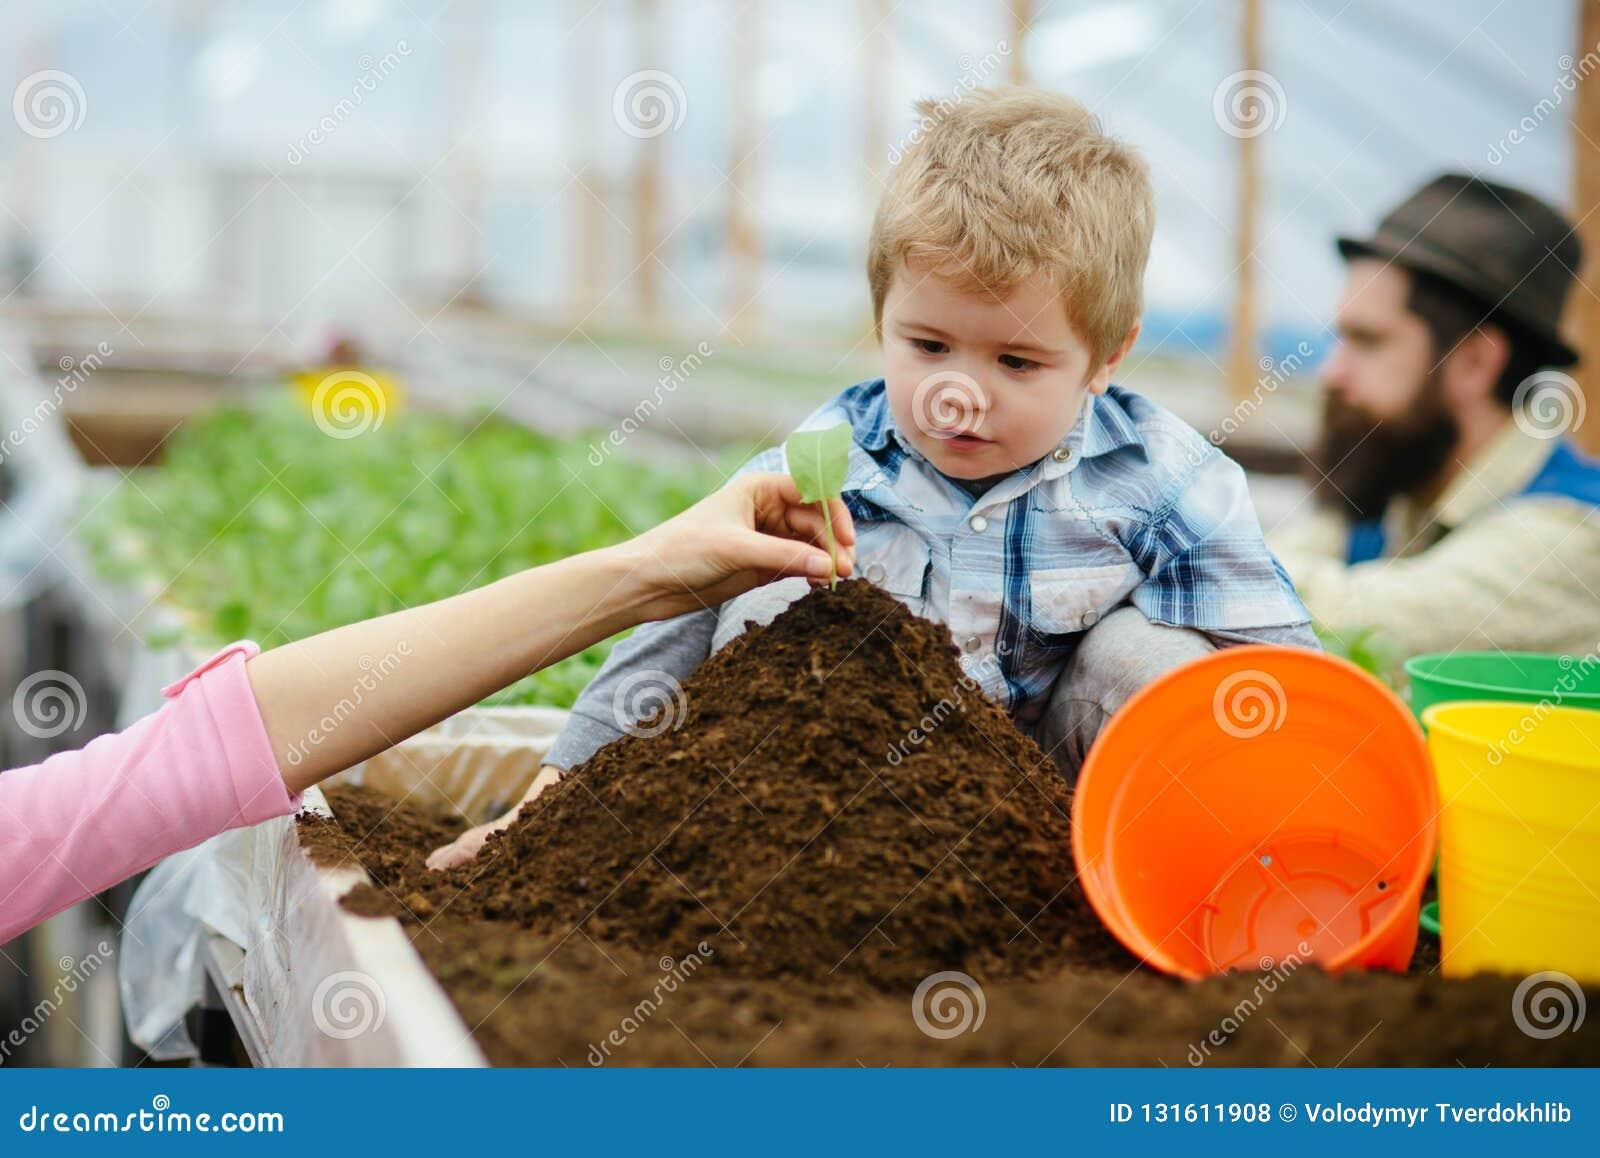 Family values. family in greenhouse. happy family values. family values concept. values and trust.